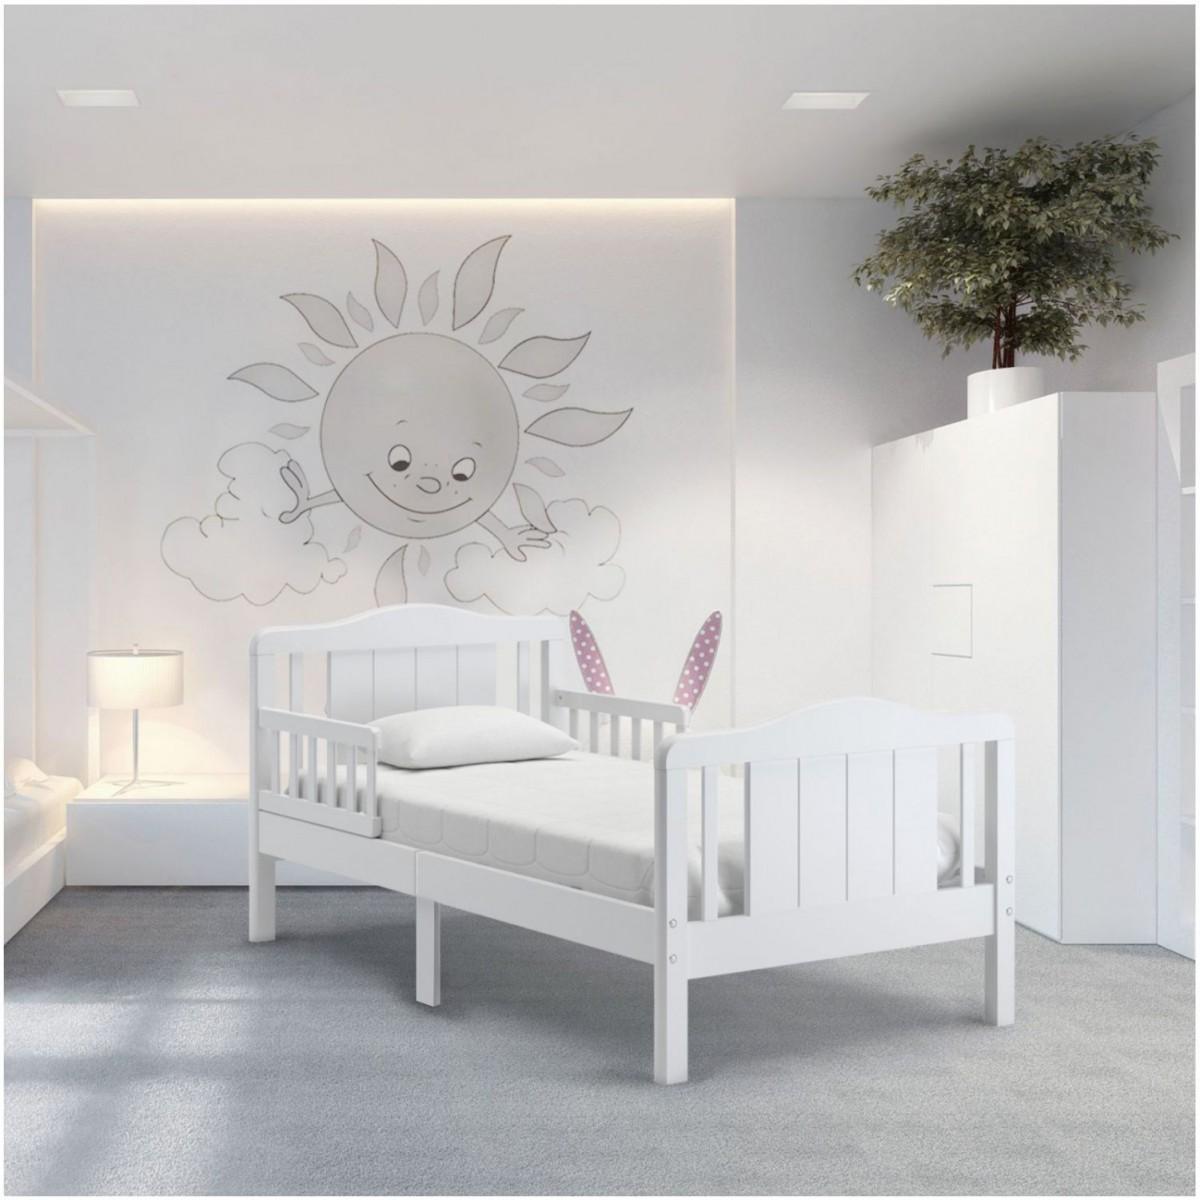 Nuovita Volo кровать подростковая